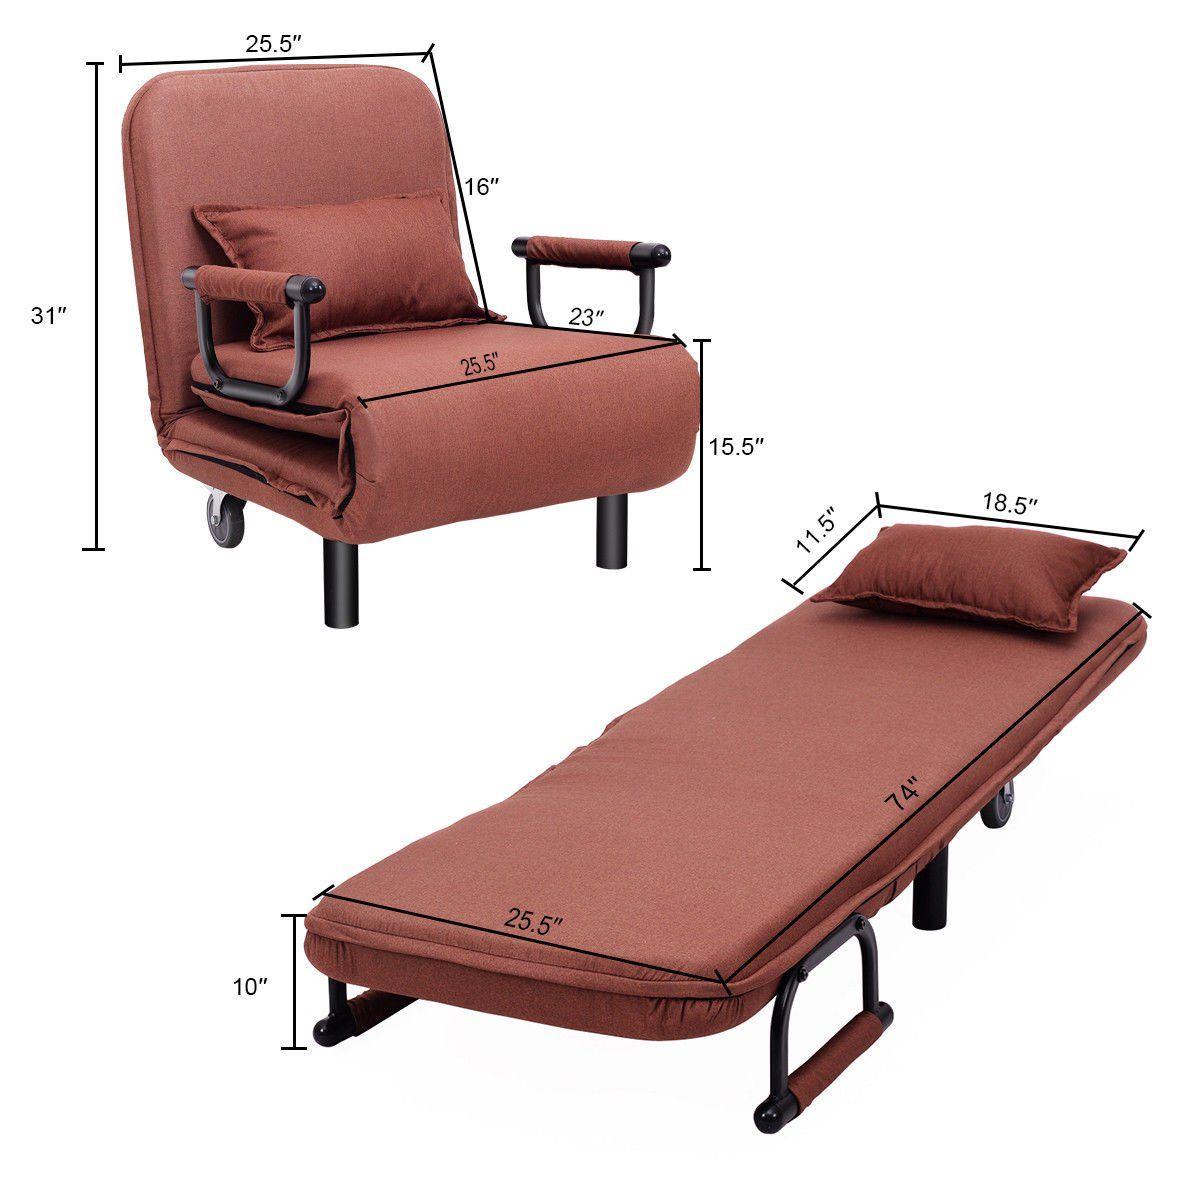 Costway Convertible Sofa Bed Folding Arm Chair Sleeper